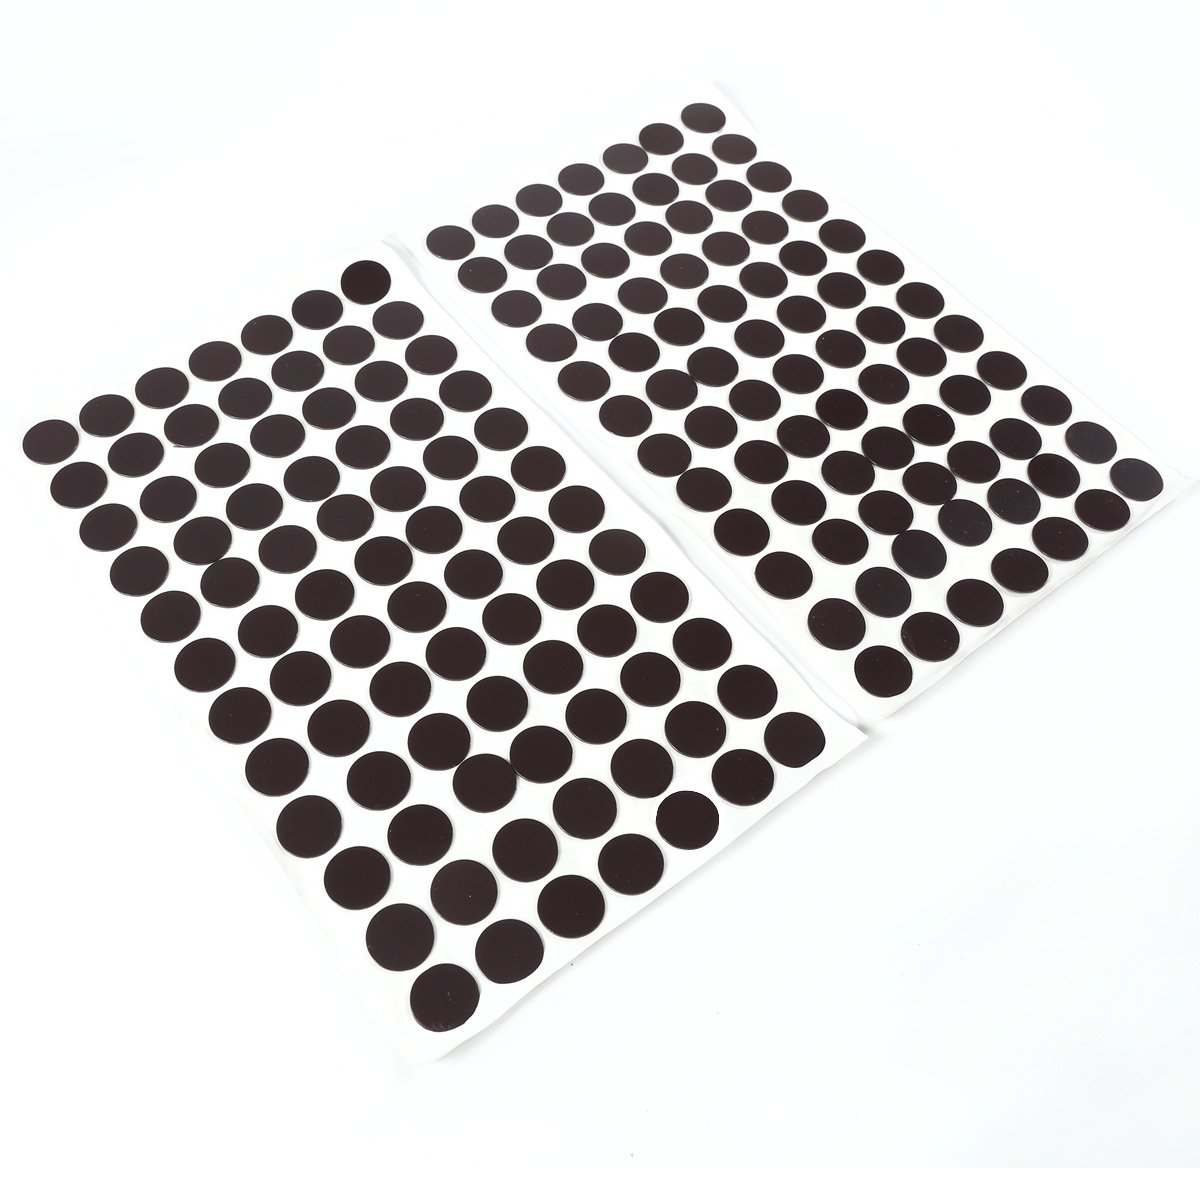 Surepromise Stick On Magnet Self Adhesive Magnetic Strip Invitation Fridge Scrapbooking Card